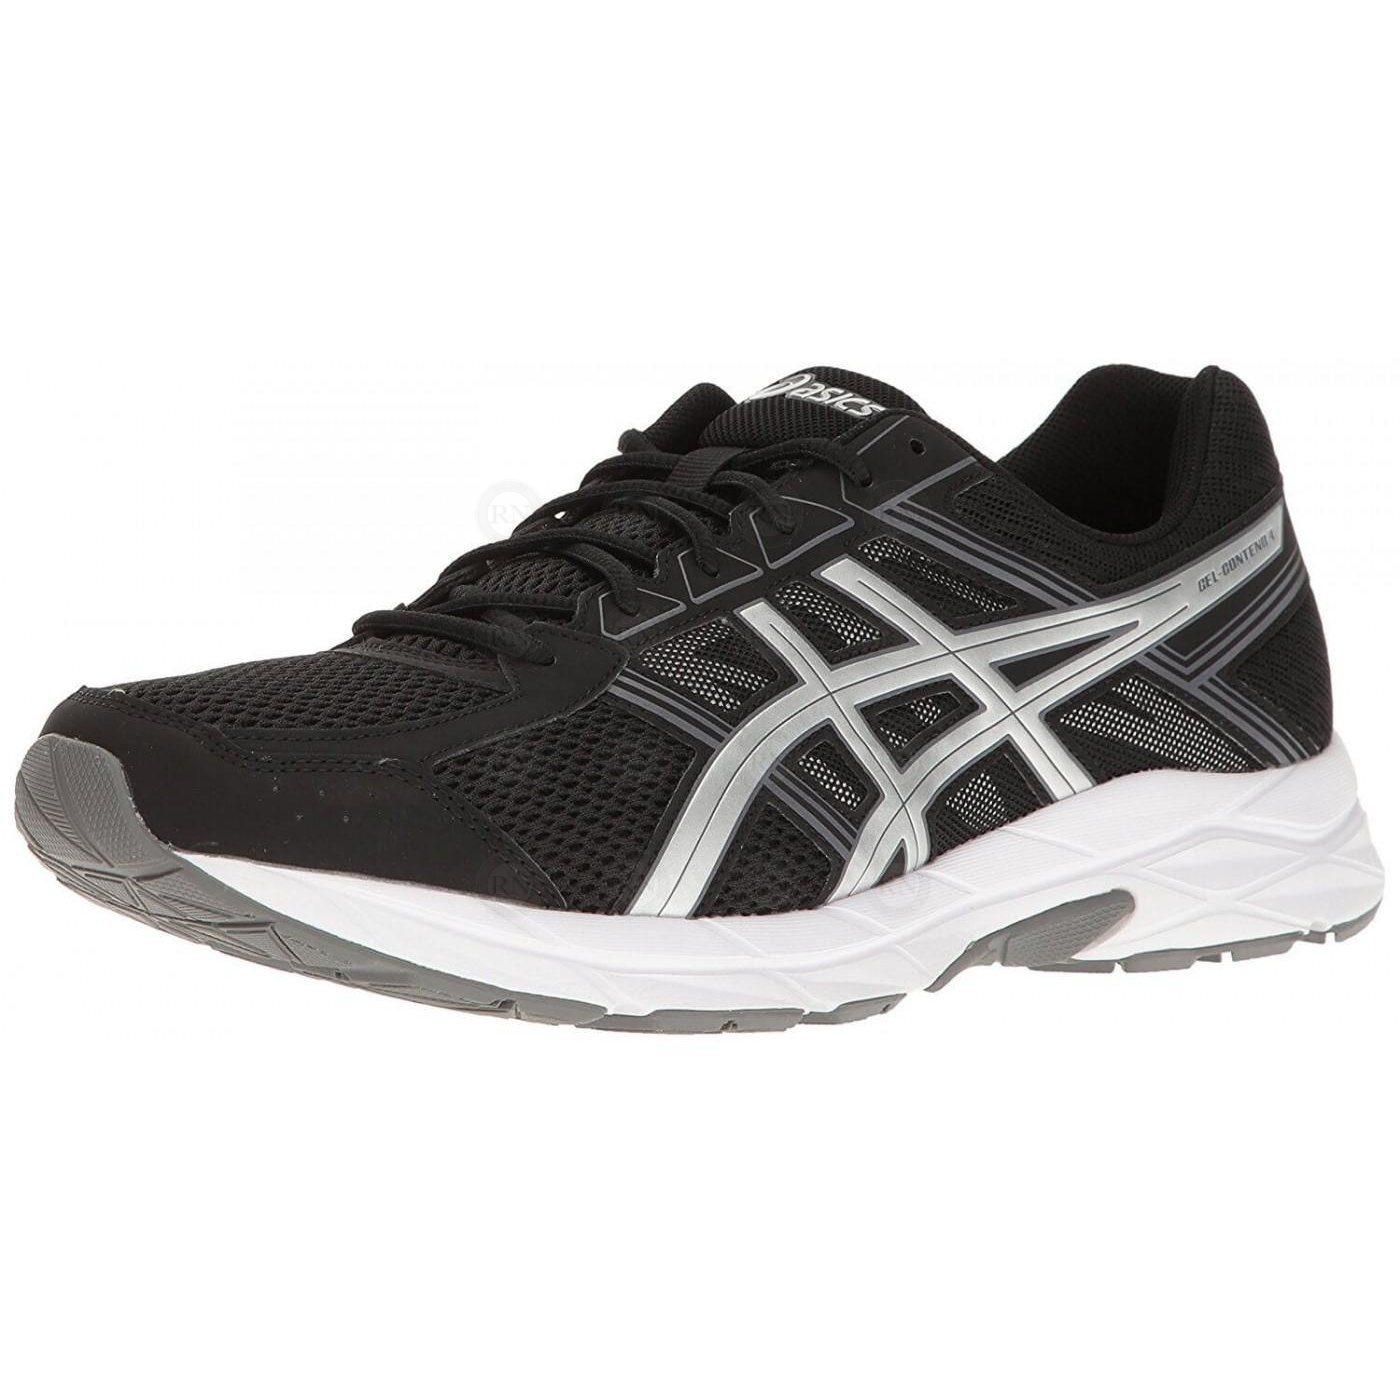 wholesale dealer 11ec1 52de7 Asics Gel-Contend 4 (4E) Running Shoes